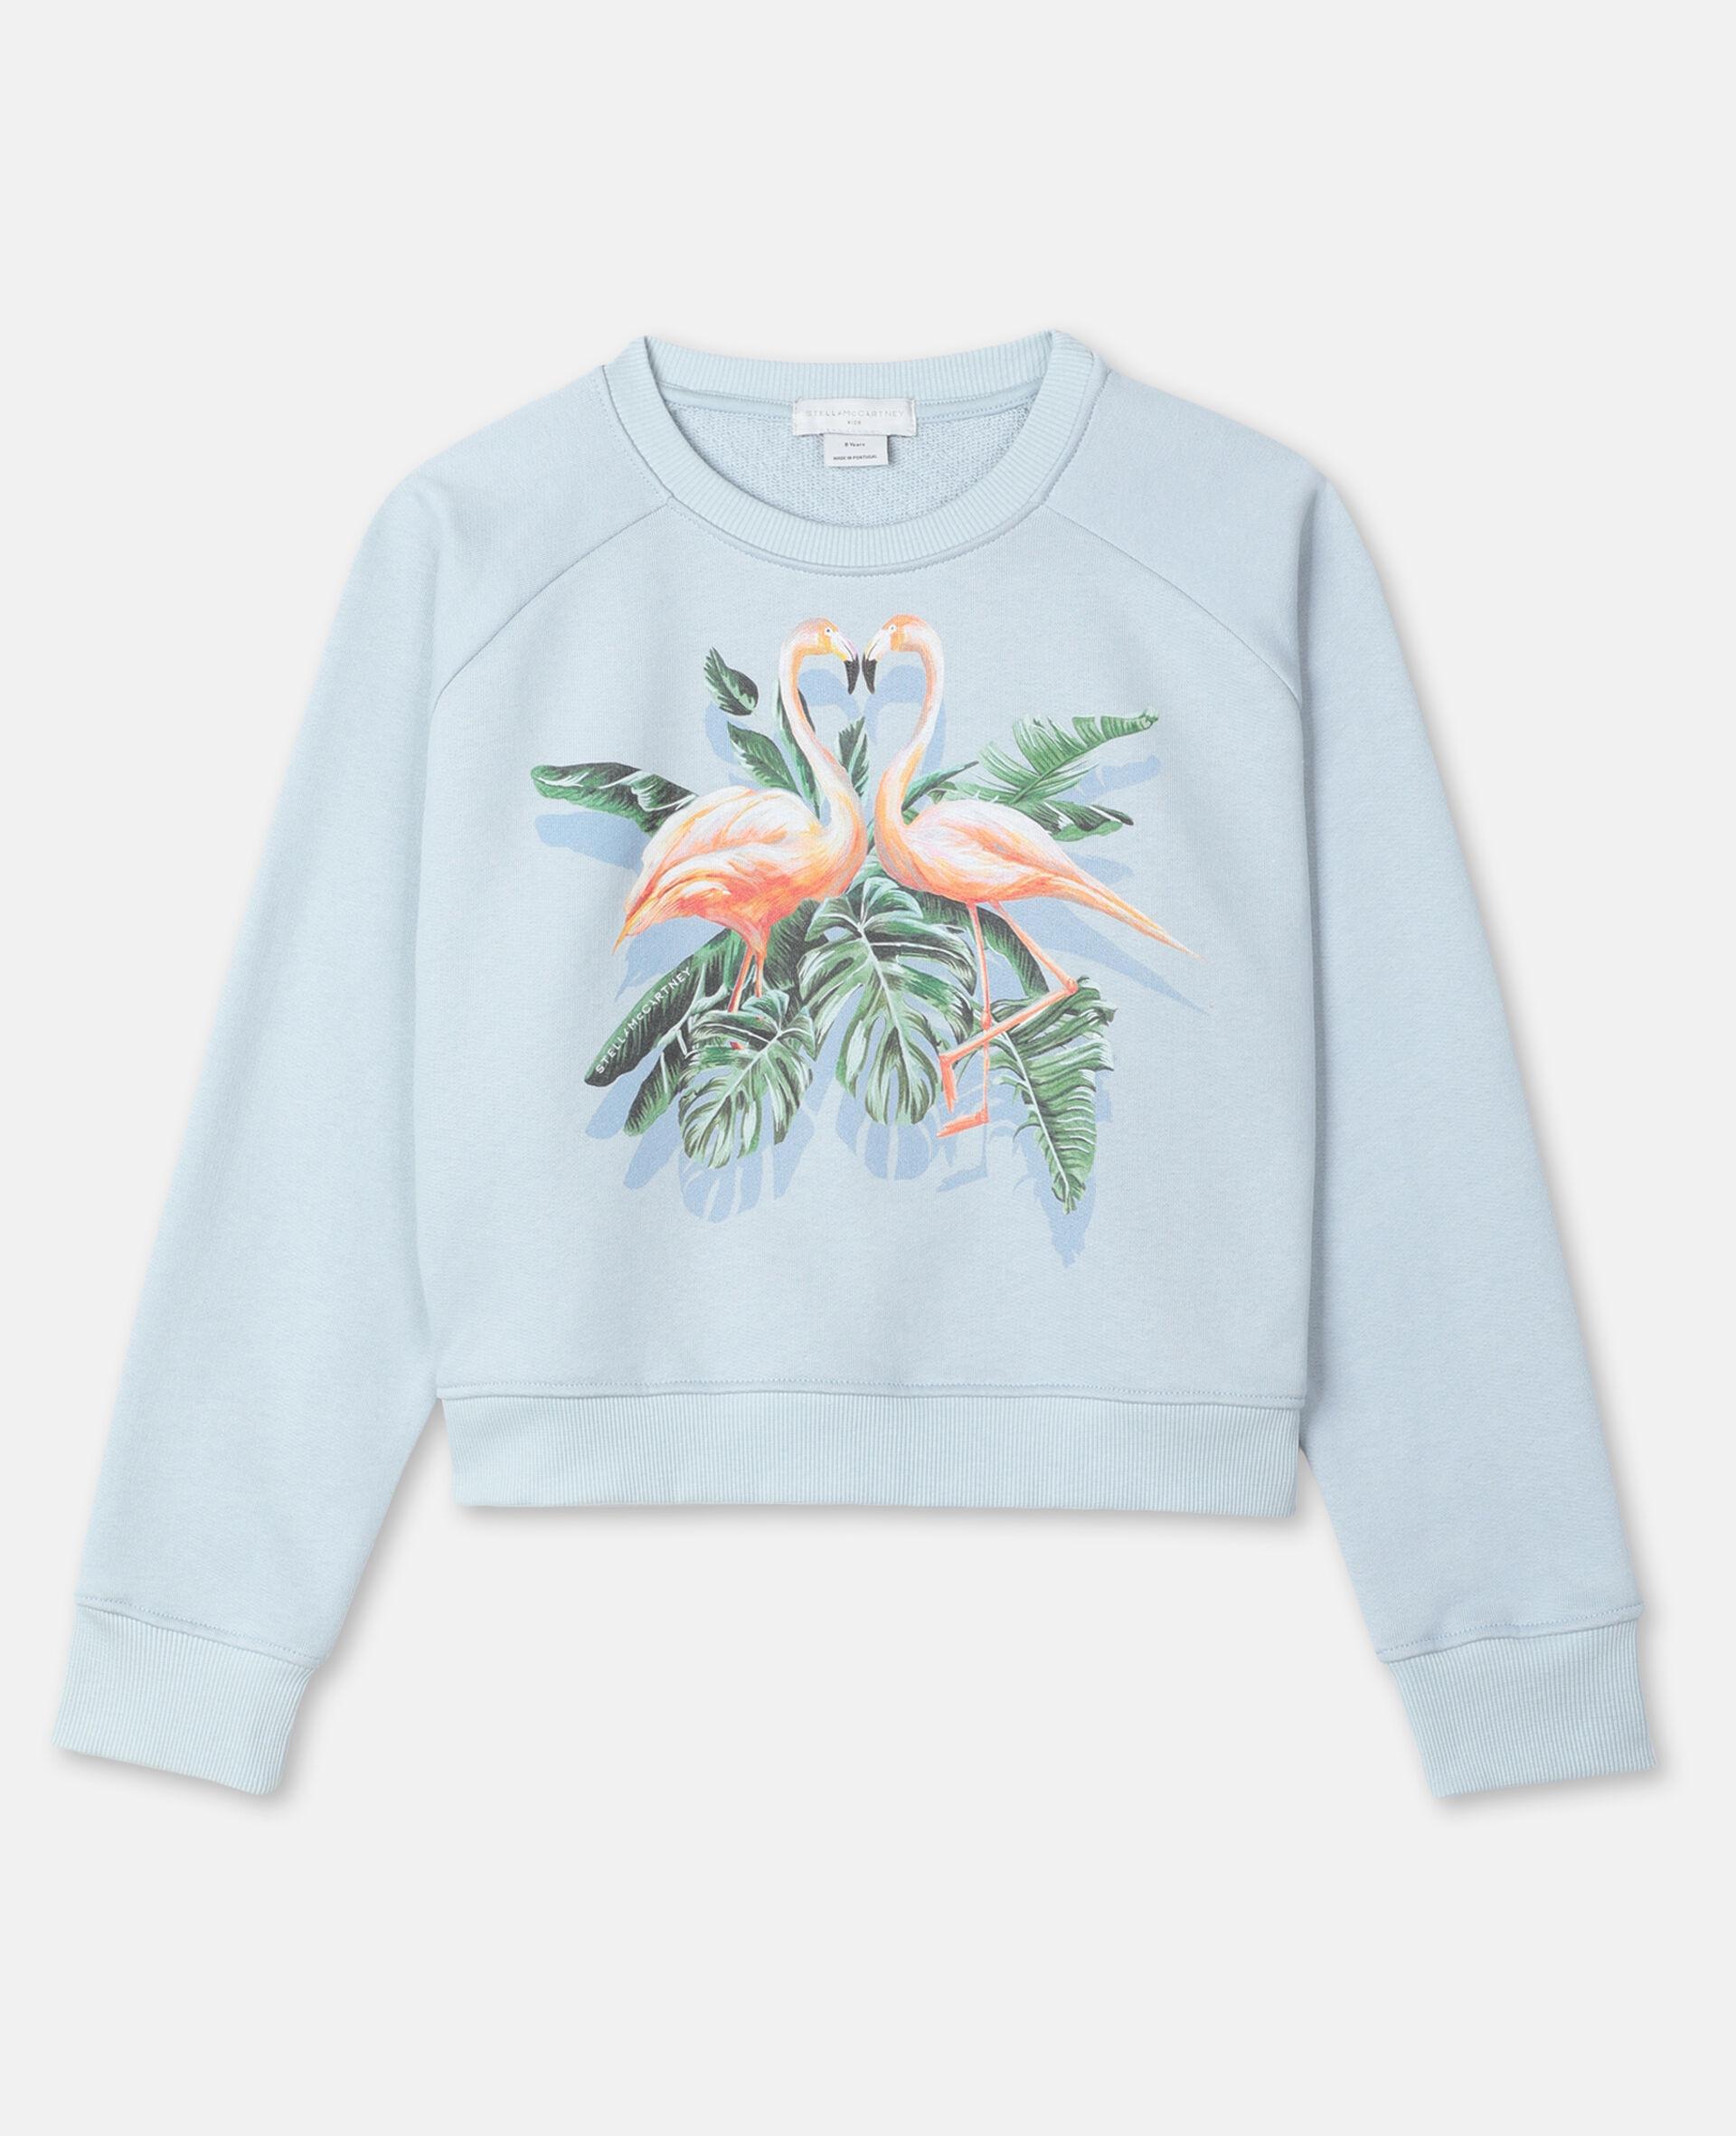 Painty Flamingo Cotton Fleece Sweatshirt -Blue-large image number 0